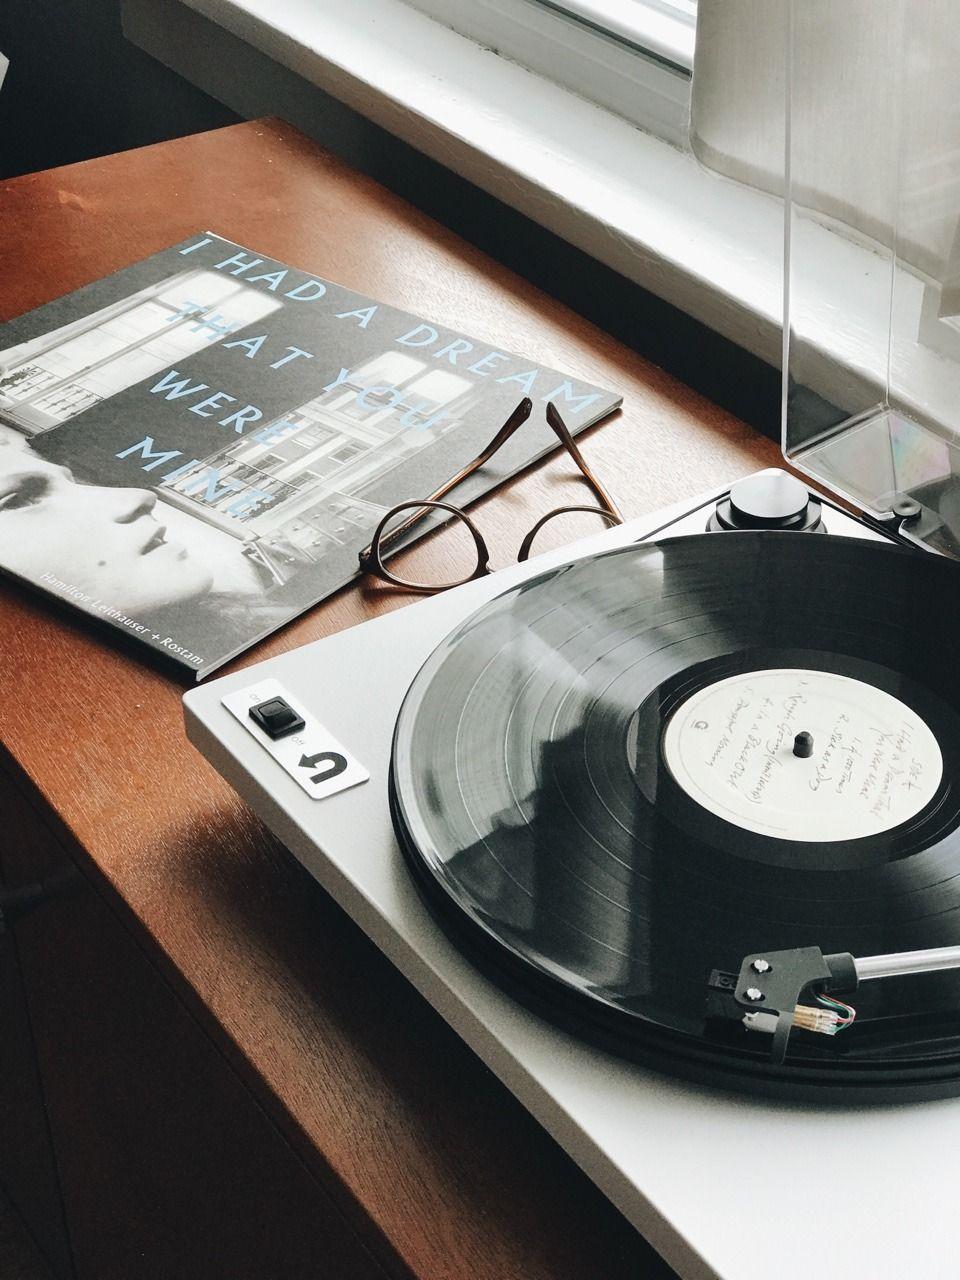 Saturday Tunes Vinyl Player Record Players Vinyl Record Player